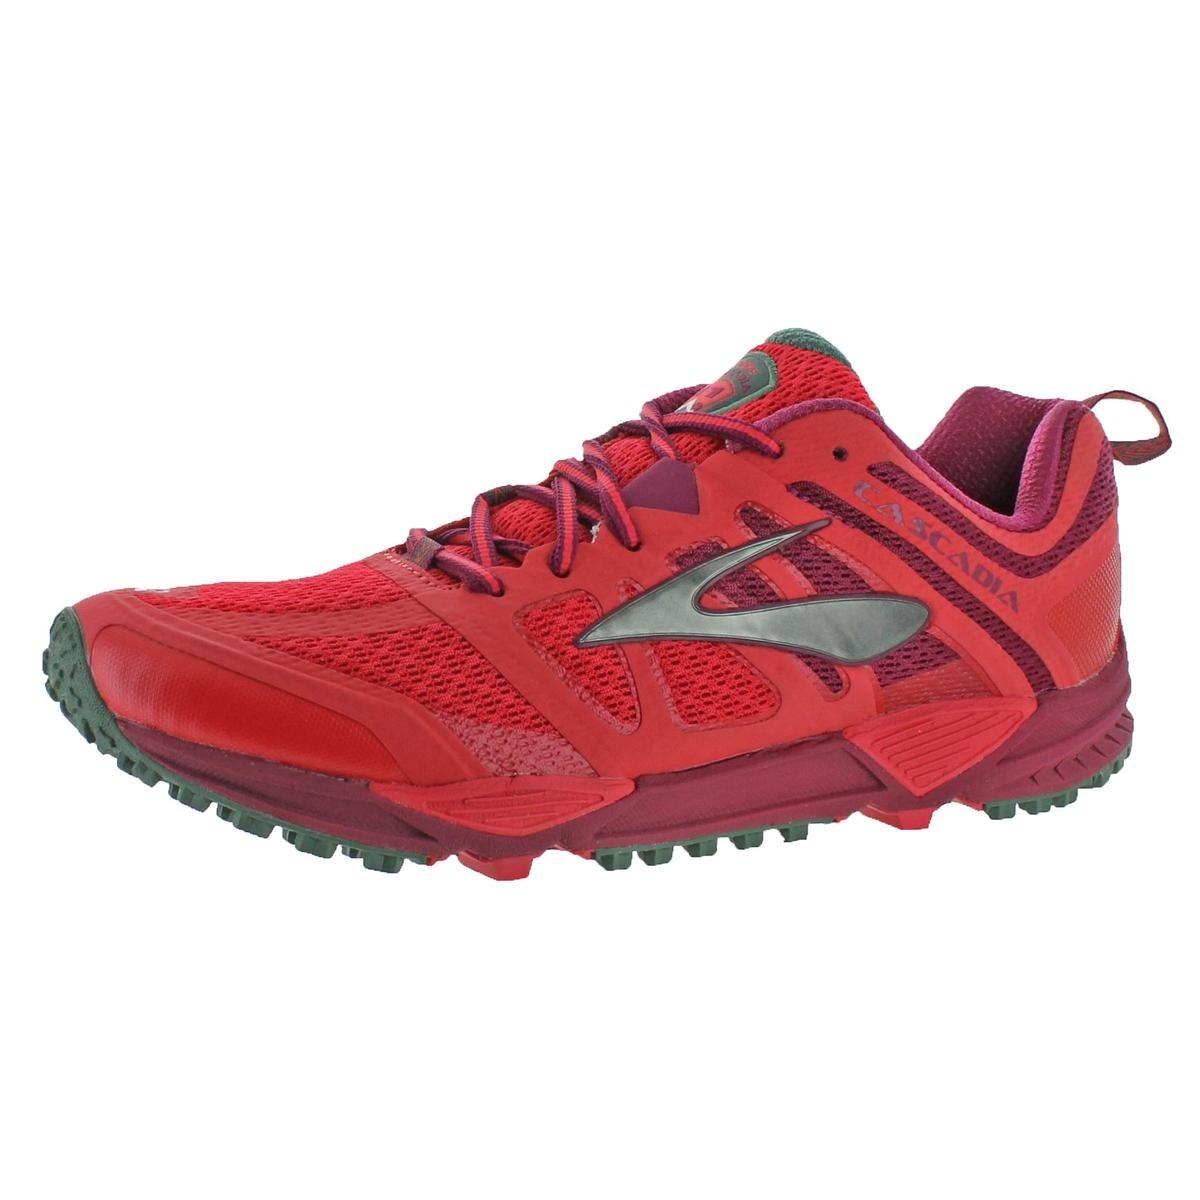 9eeb5bcfbfb Shop Brooks Womens Cascadia 11 Trail Running Shoes Athletic CrossFit - 12  medium (b